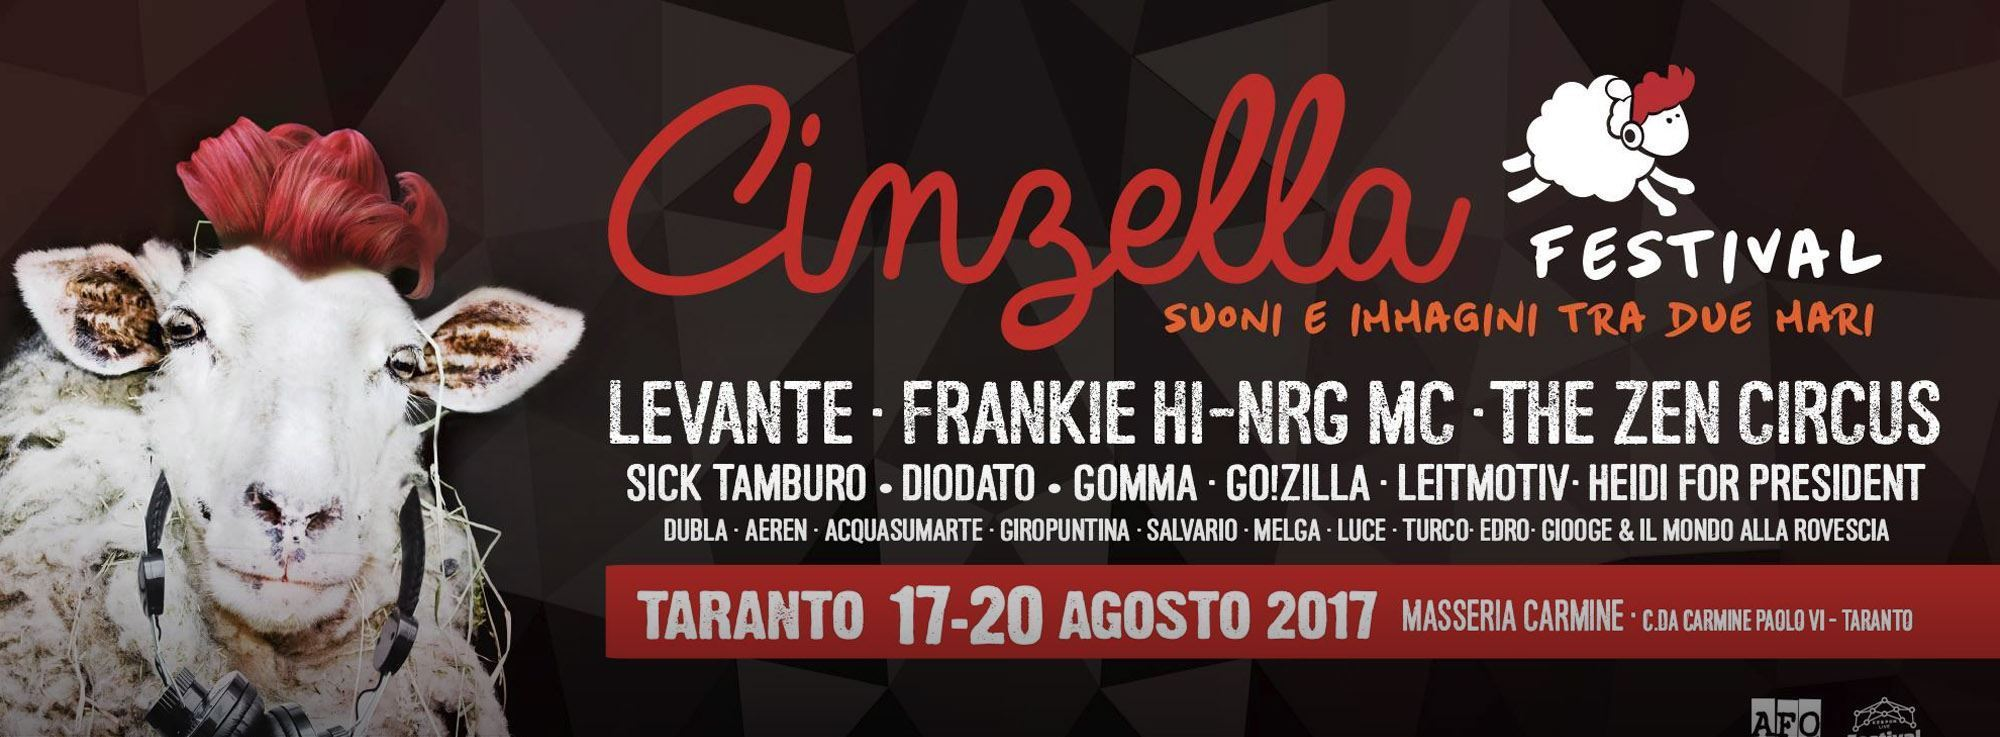 Taranto: Cinzella Festival 2017